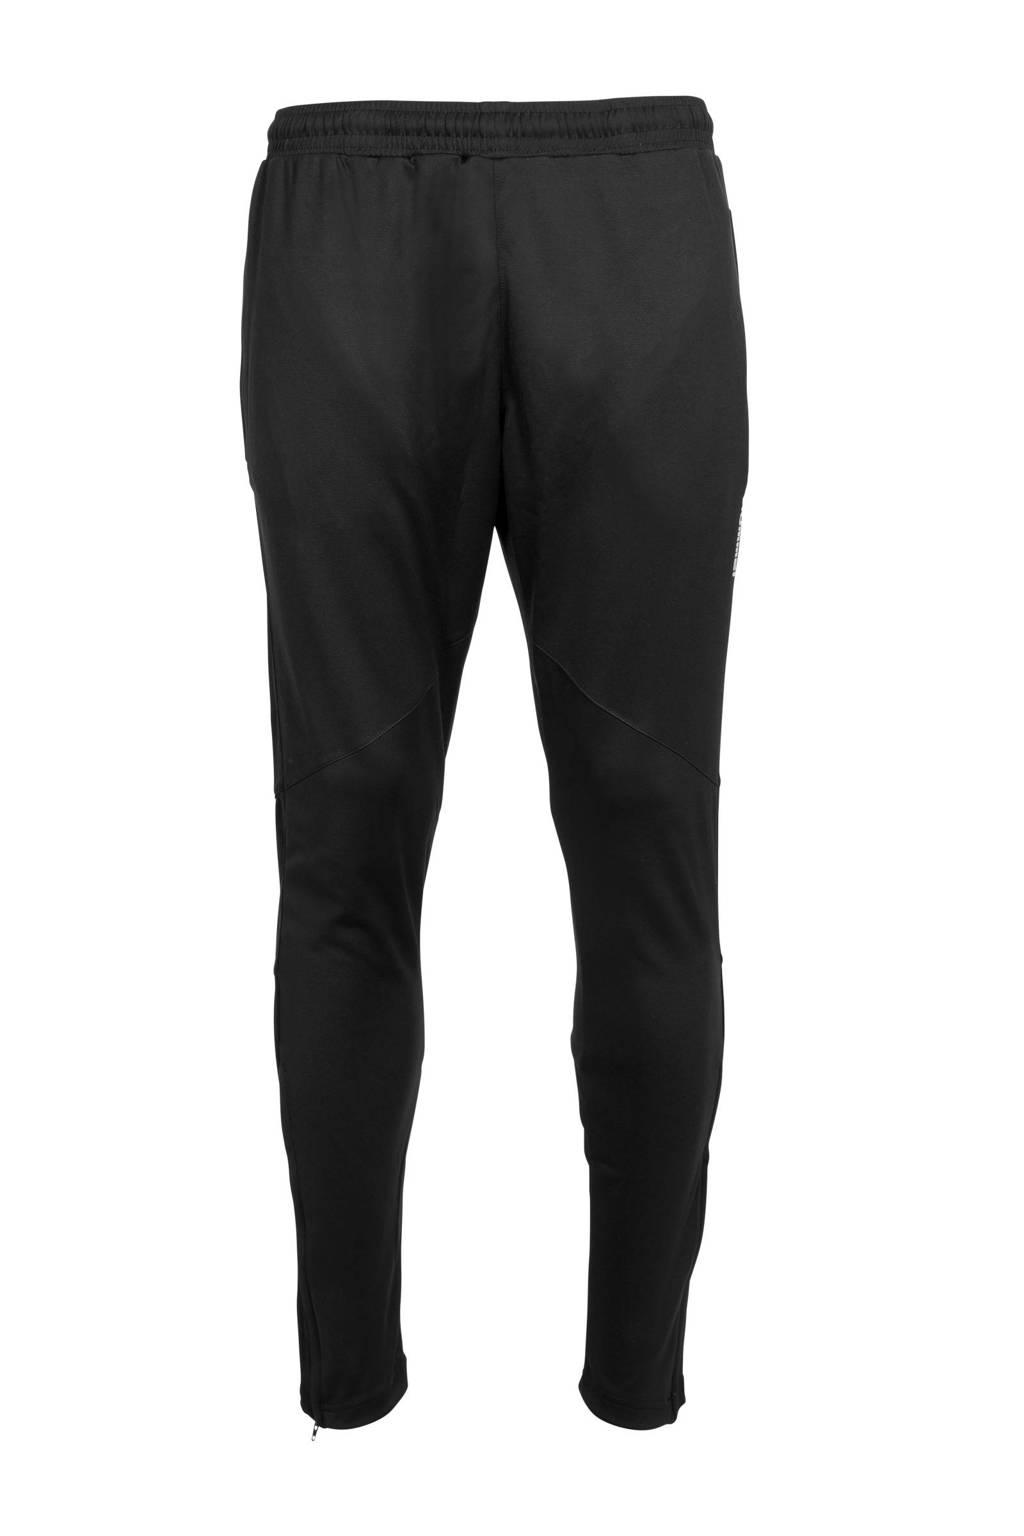 hummel Senior  trainingsbroek zwart, Zwart